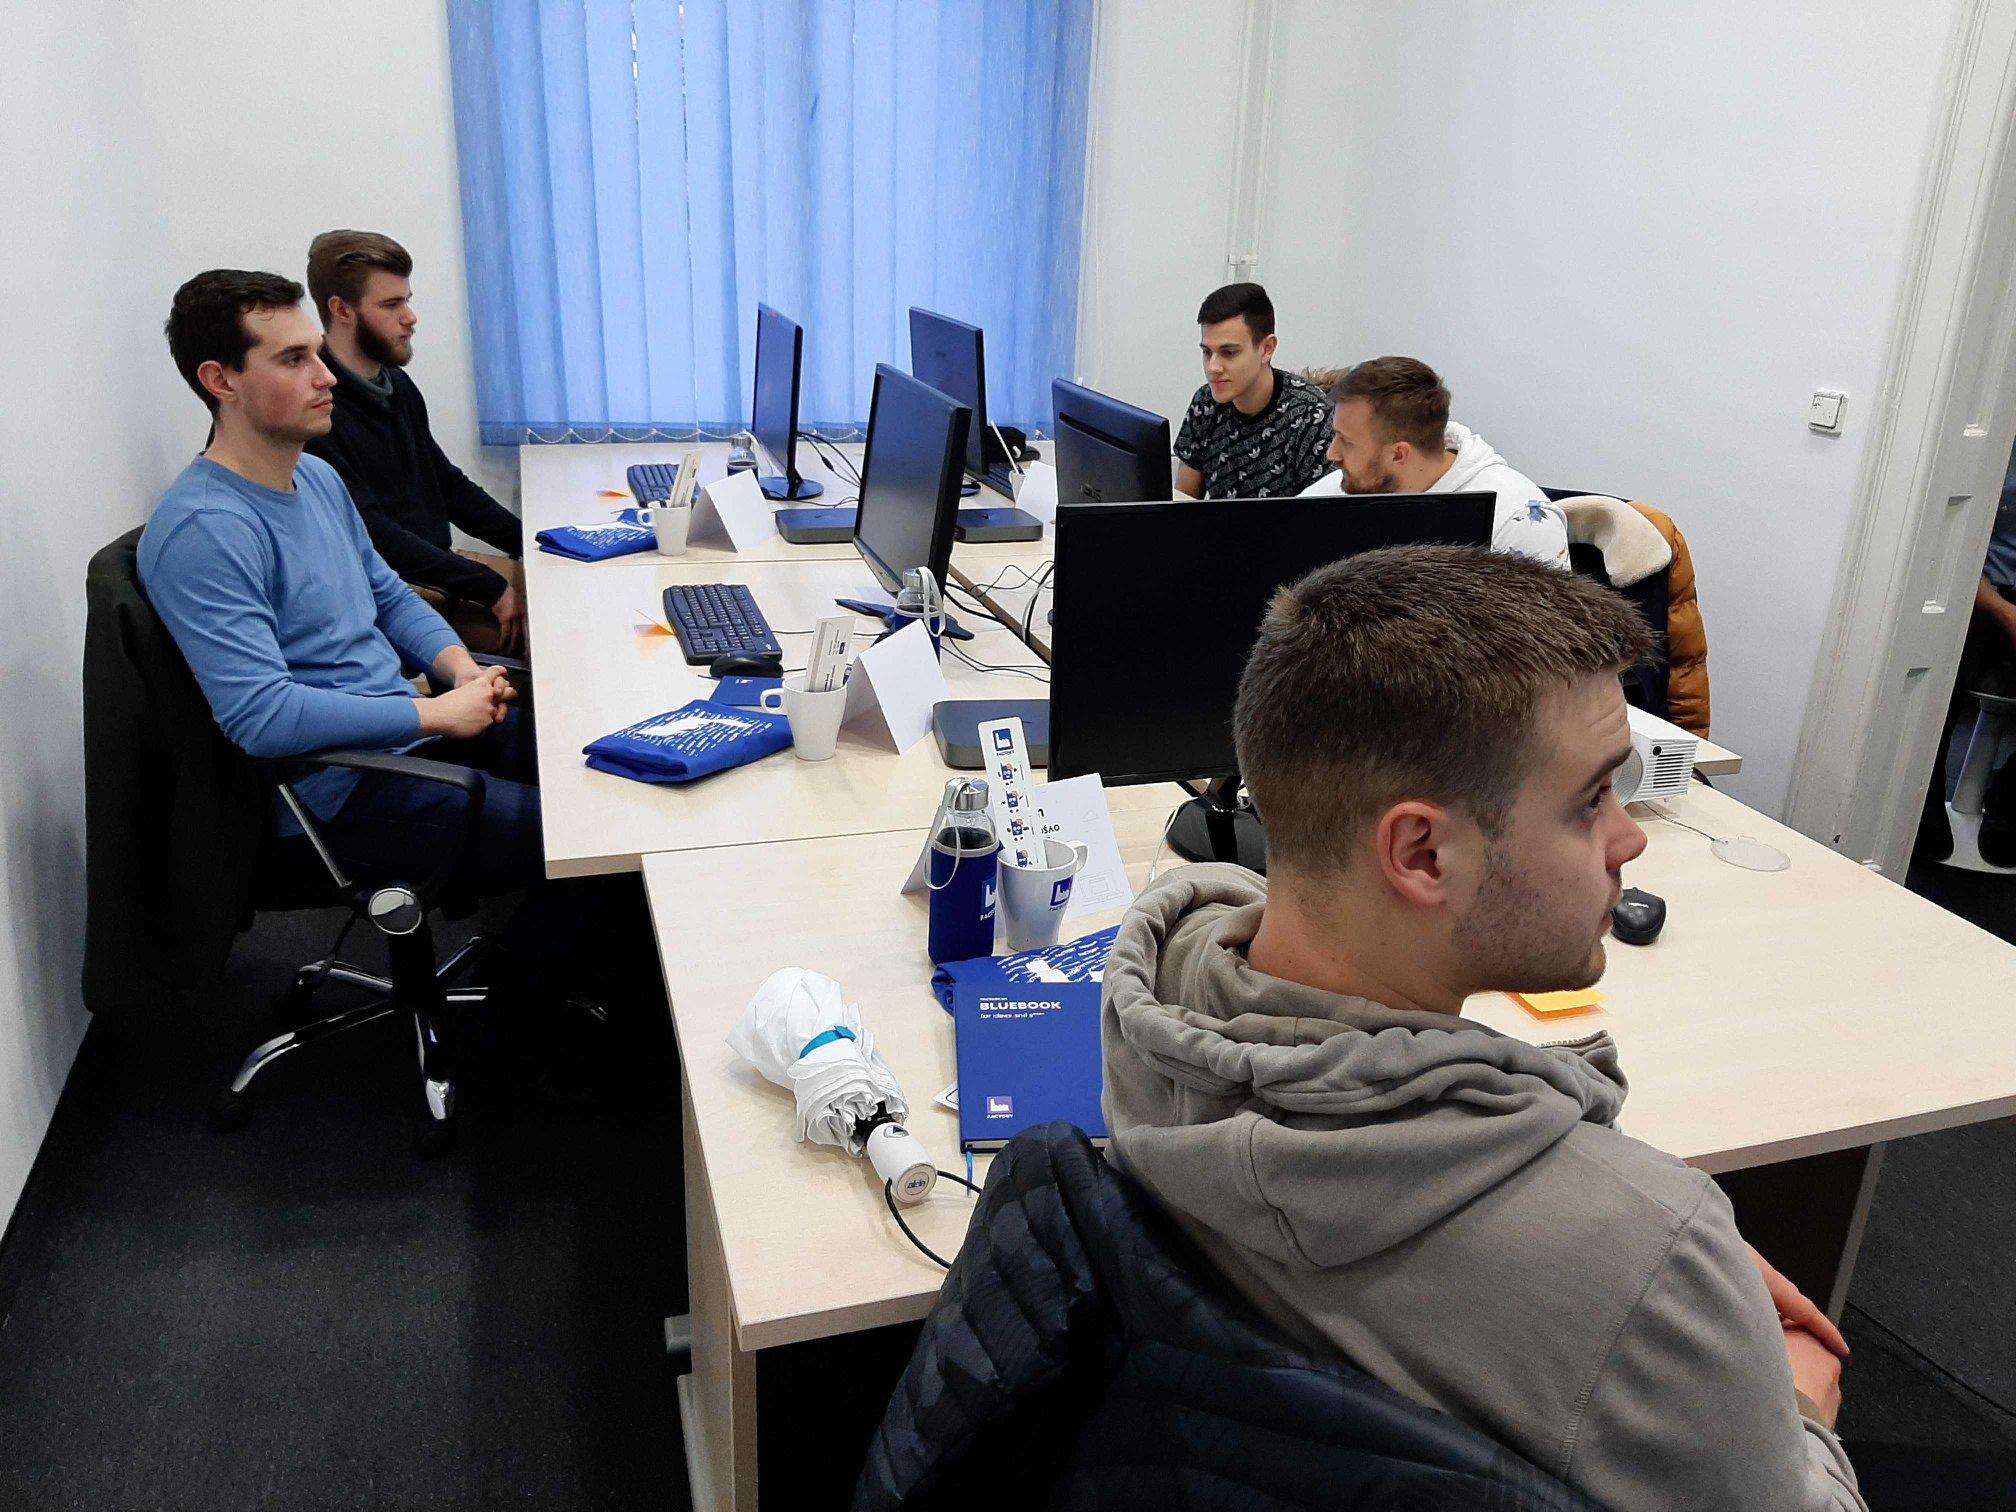 iOS academy in Factory 2020